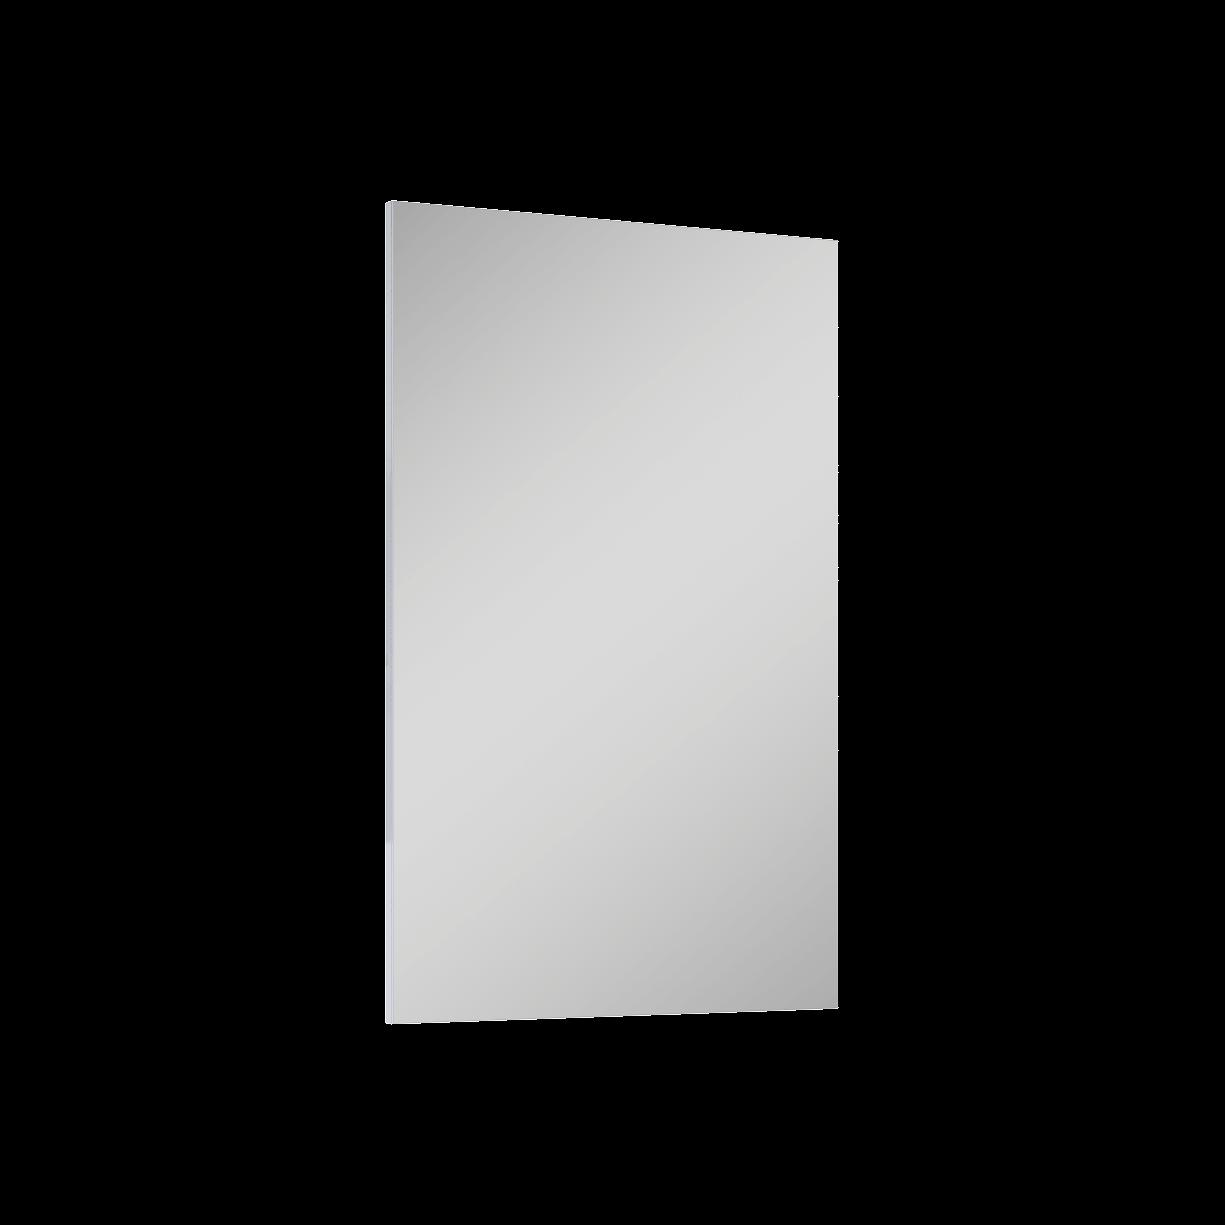 Lustro Elita Na płycie SOTE 50/80cm 166451